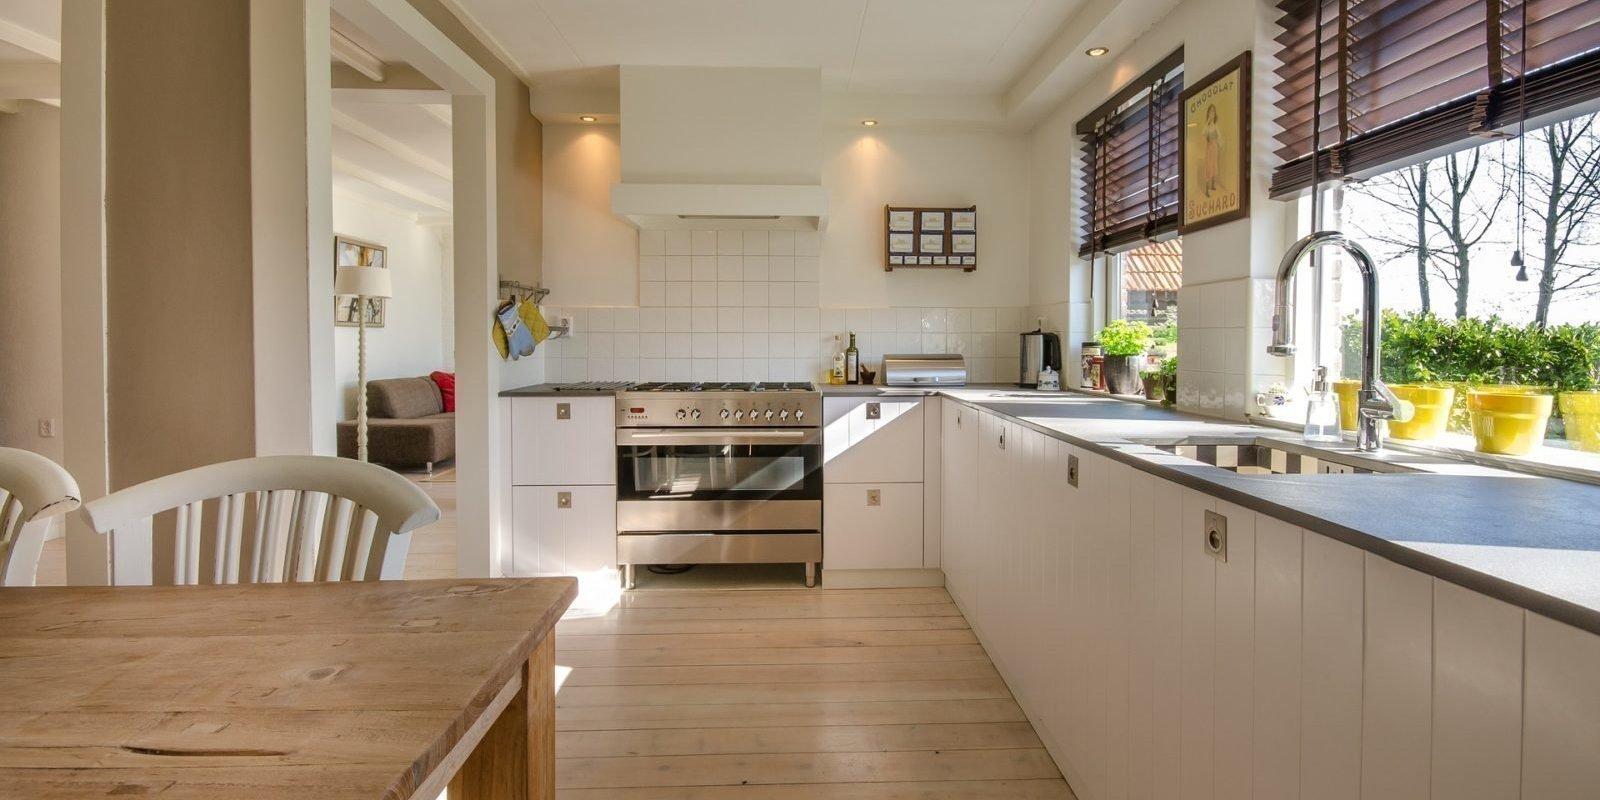 Bakersfield Ca Real Estate Samuel Reyna,Home Design Furnishings